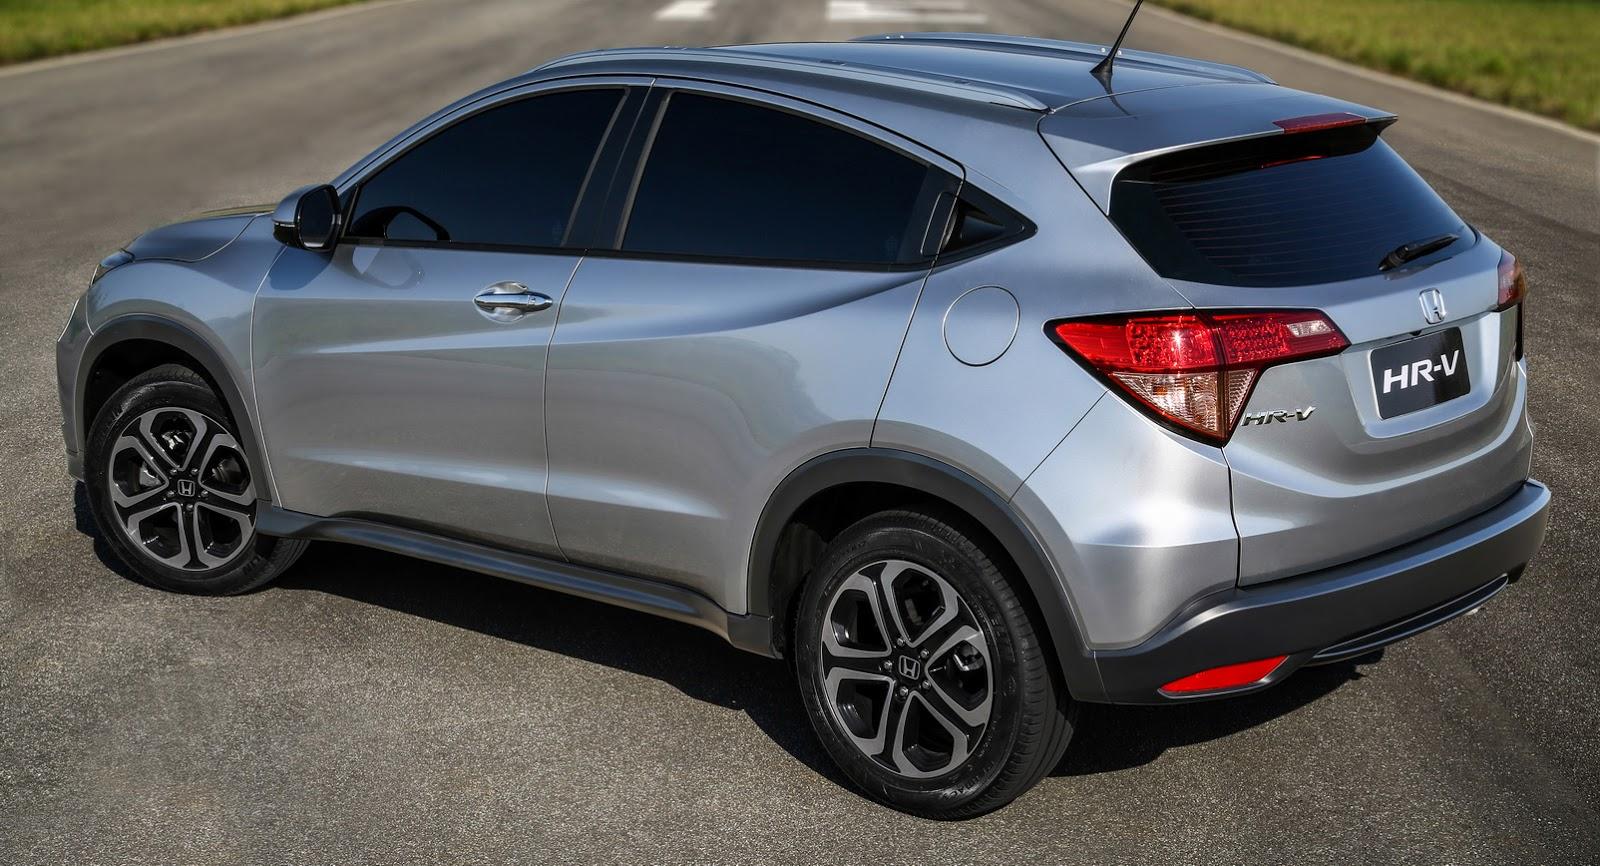 Honda HR-V (Vezel) Gets Watered Down for Brazil Market - autoevolution